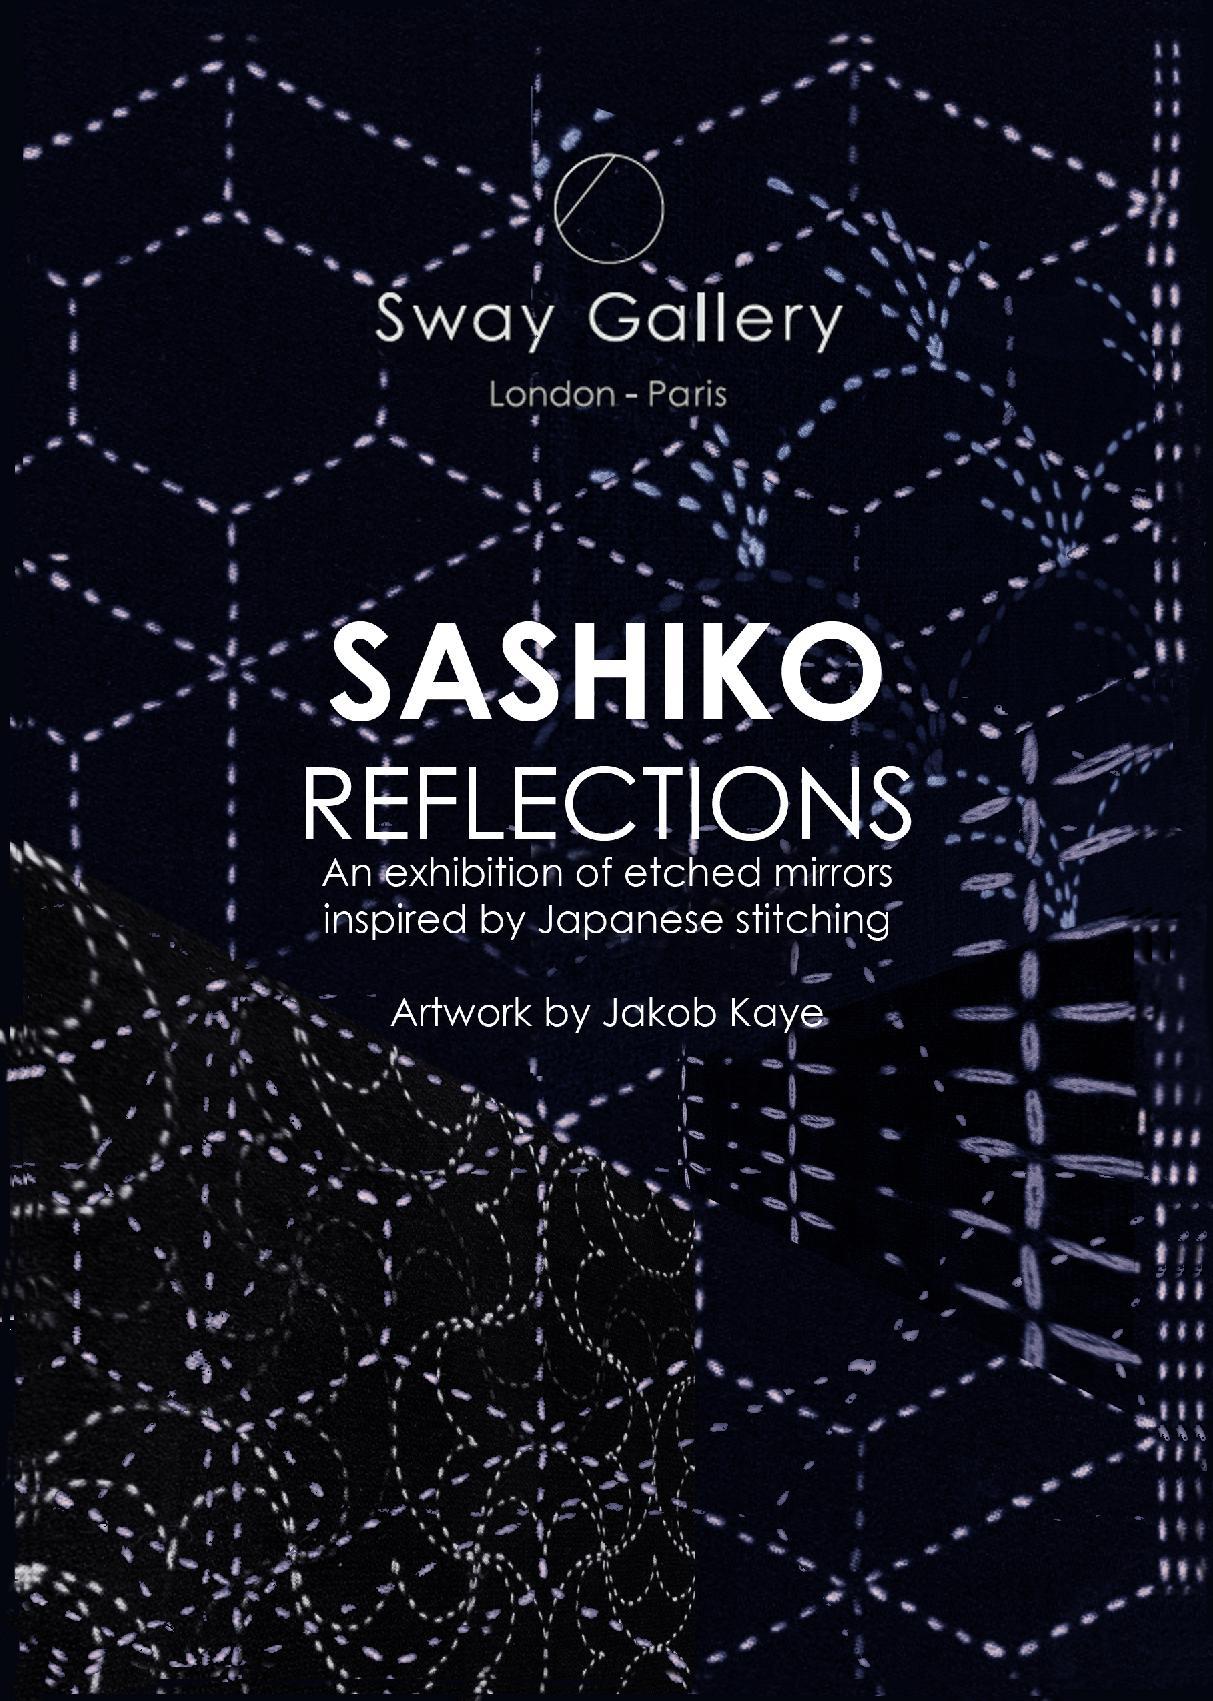 Sashiko Reflections Exhibition